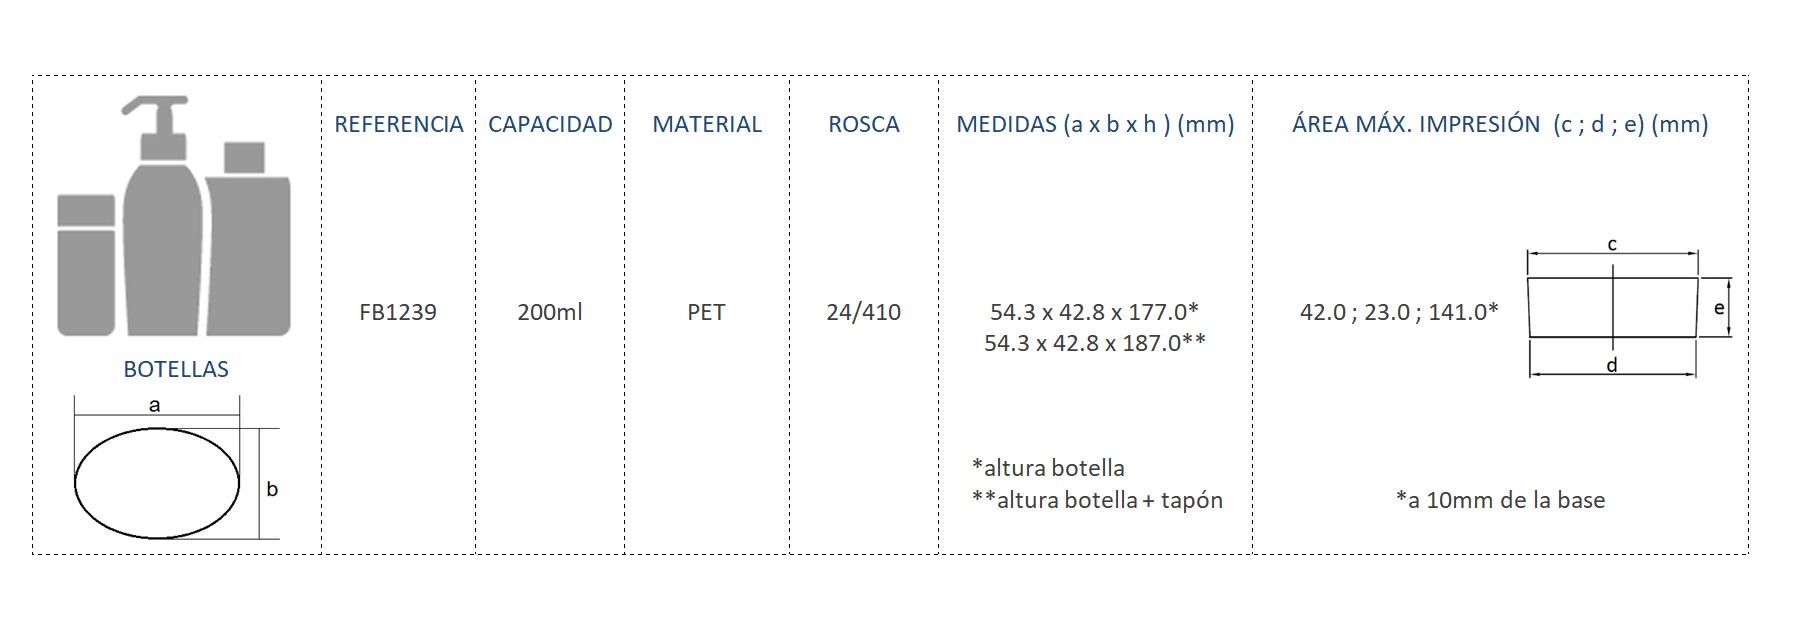 Cuadro de materiales botella FB1239